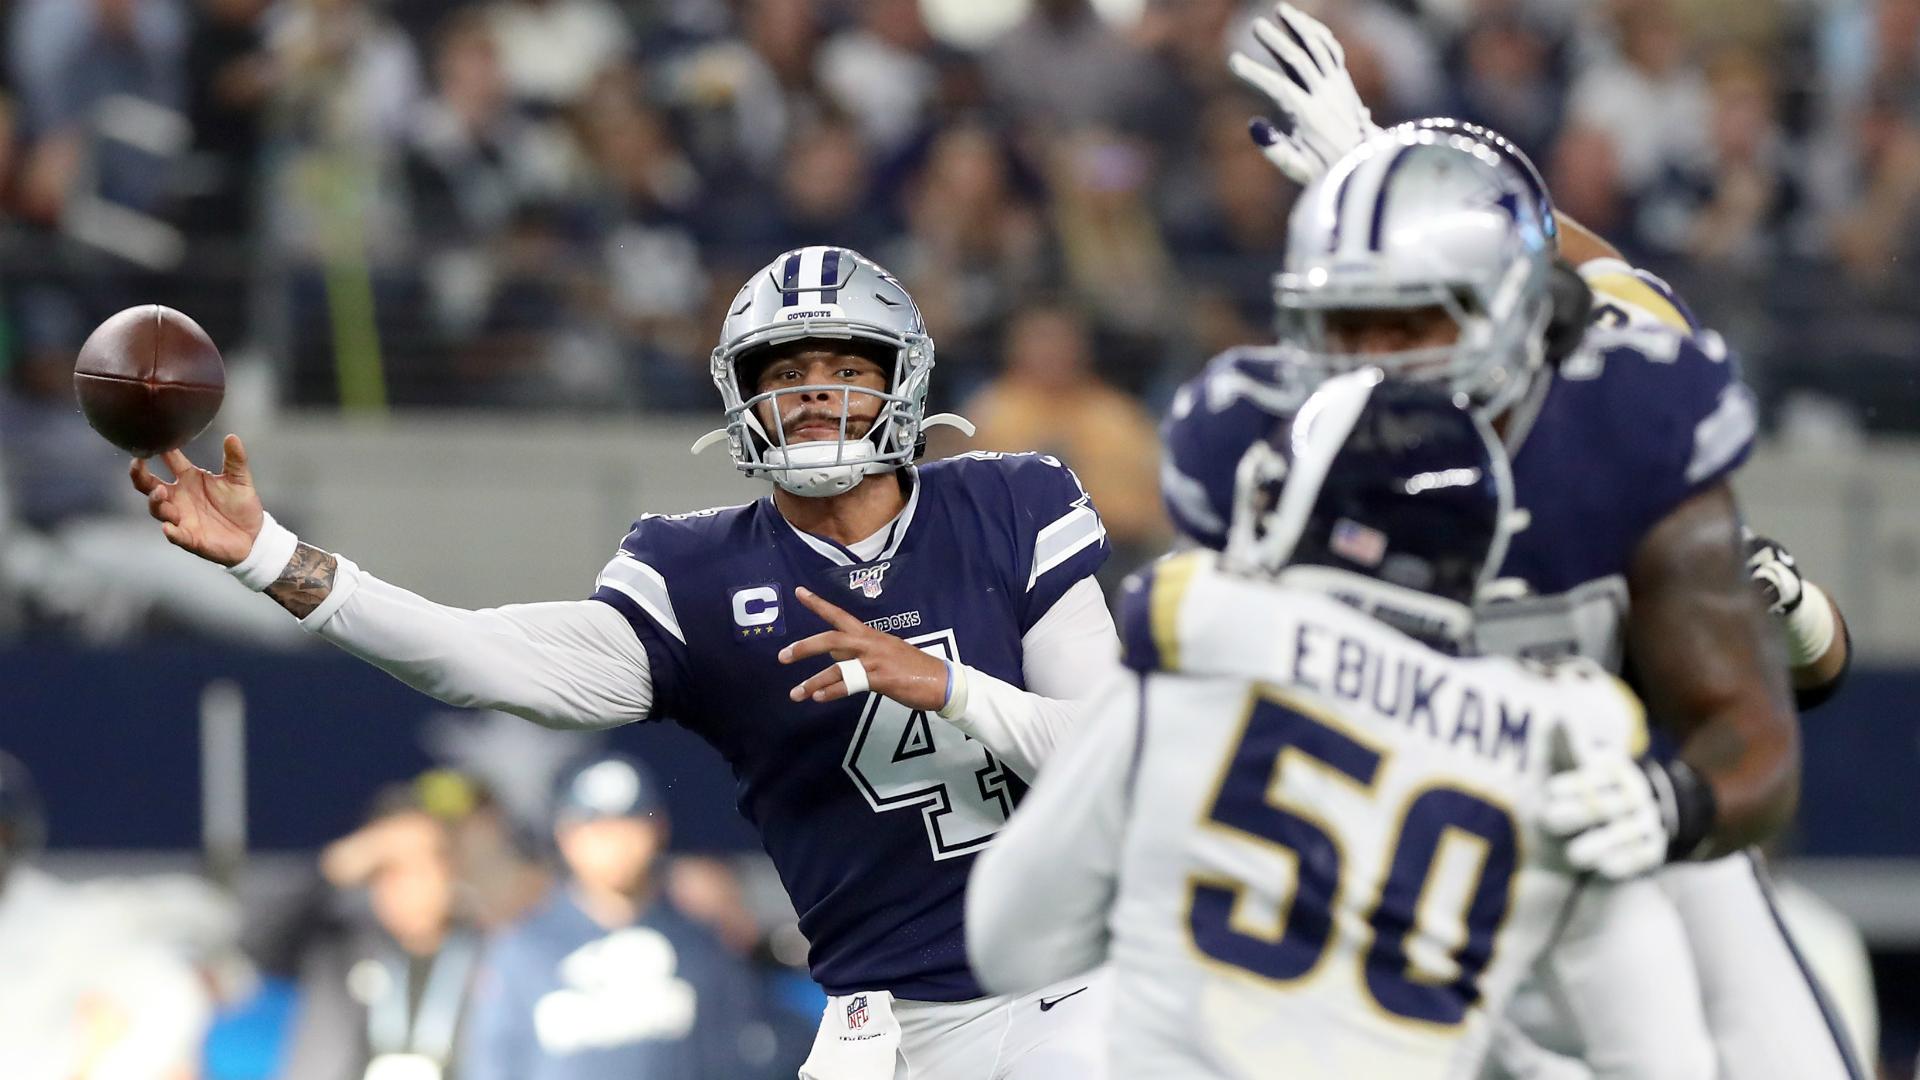 Cowboys vs. Rams final score: Dallas dominates in Week 15 blowout